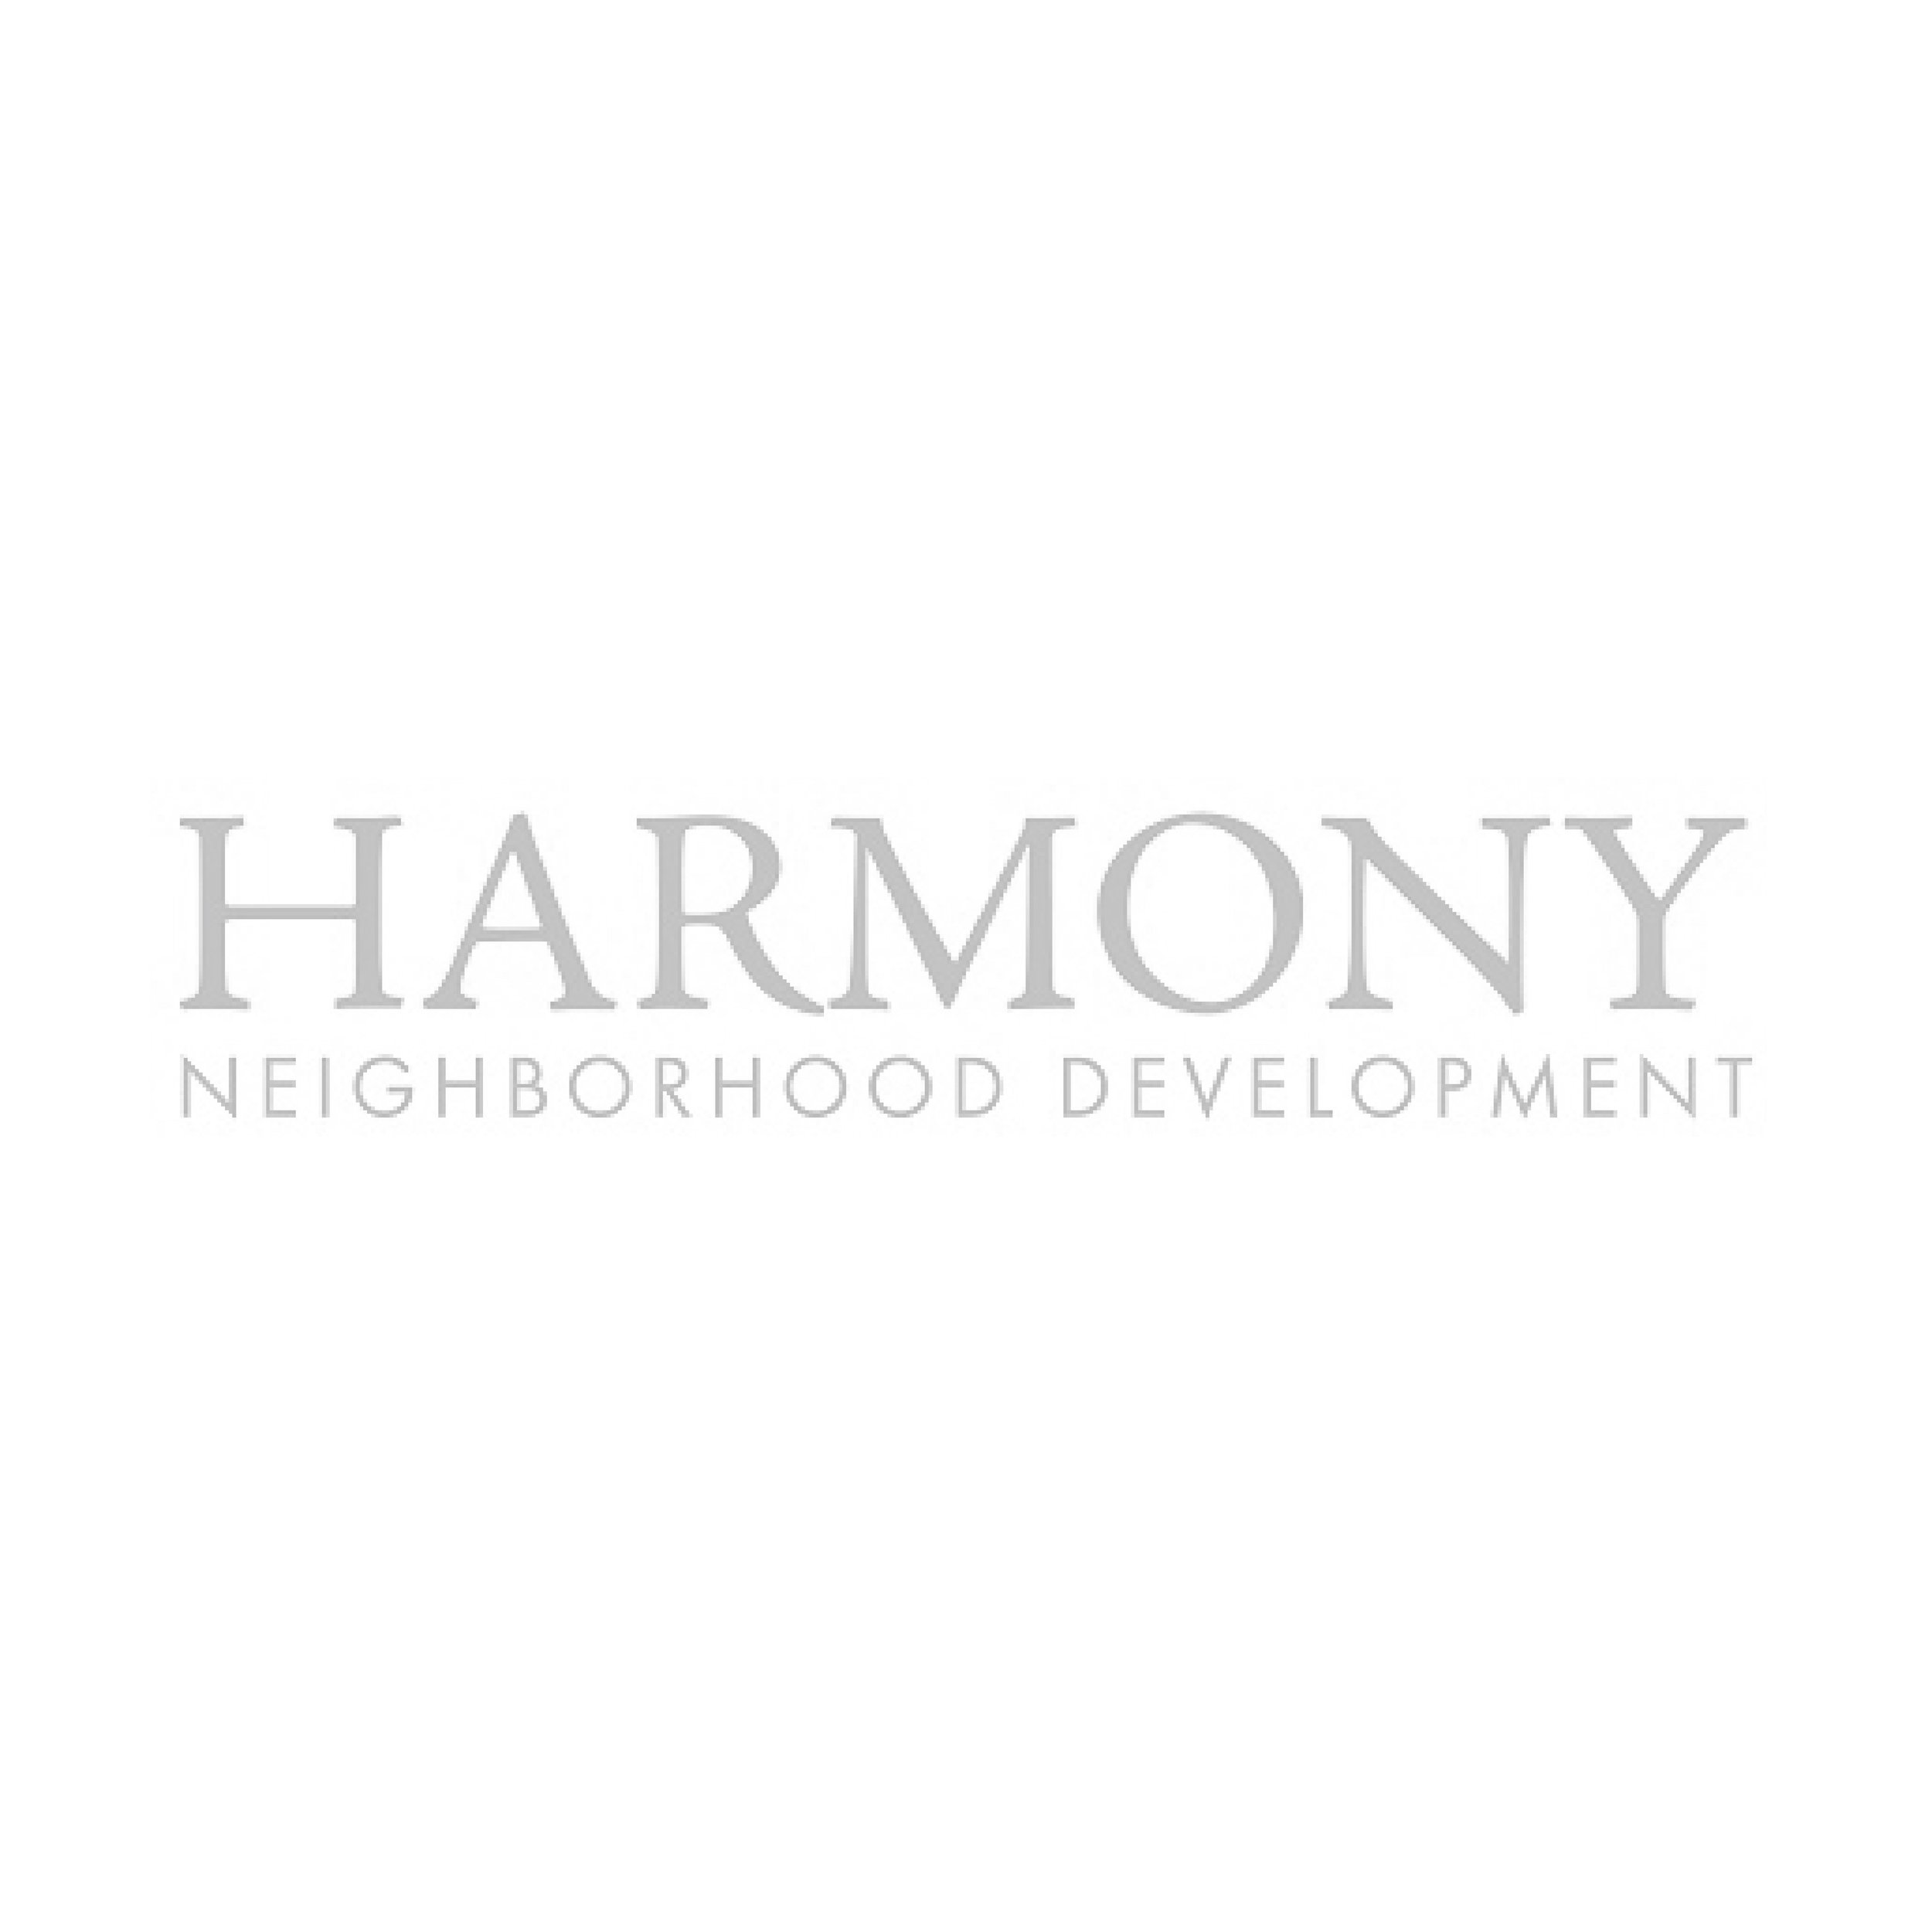 Harmony-01 2.jpg